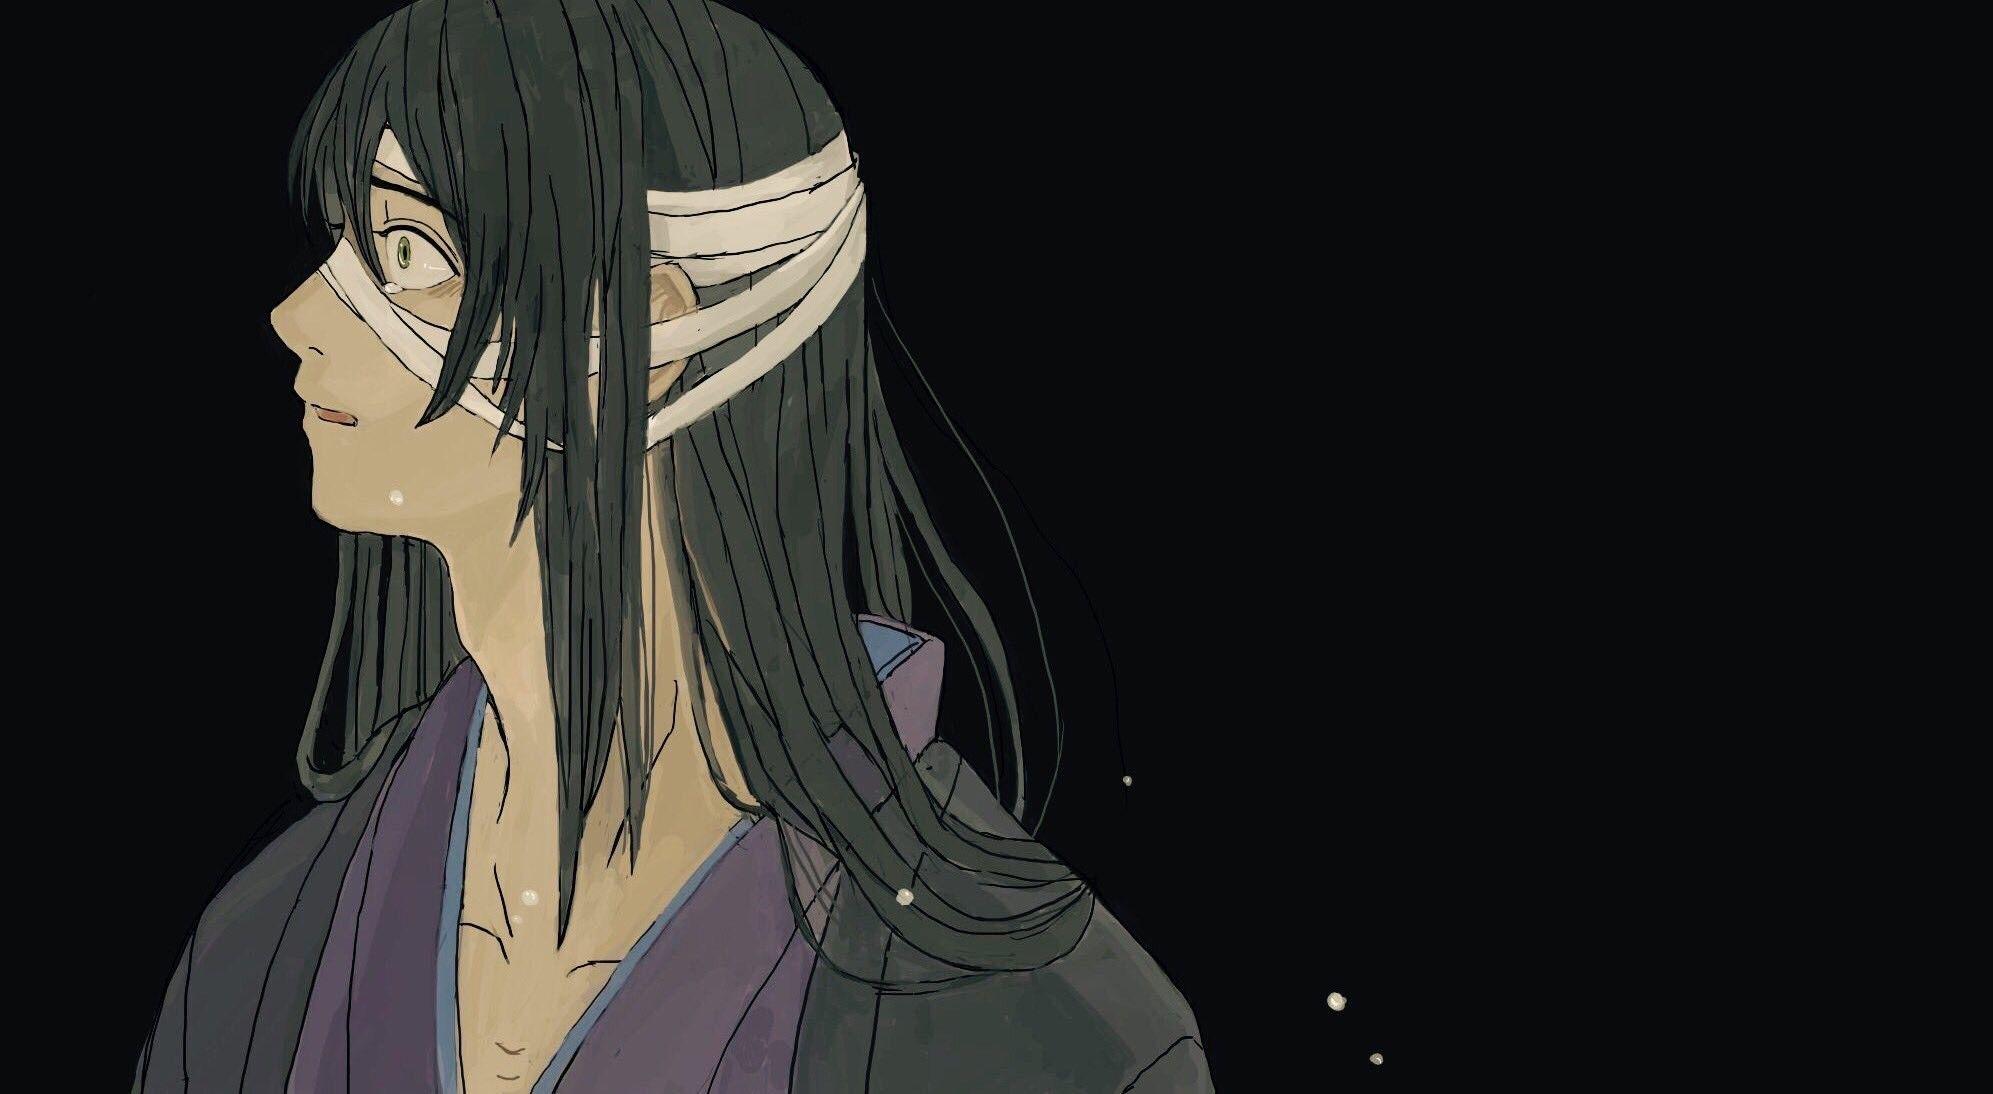 Zura Yorozuya Eien ni nare